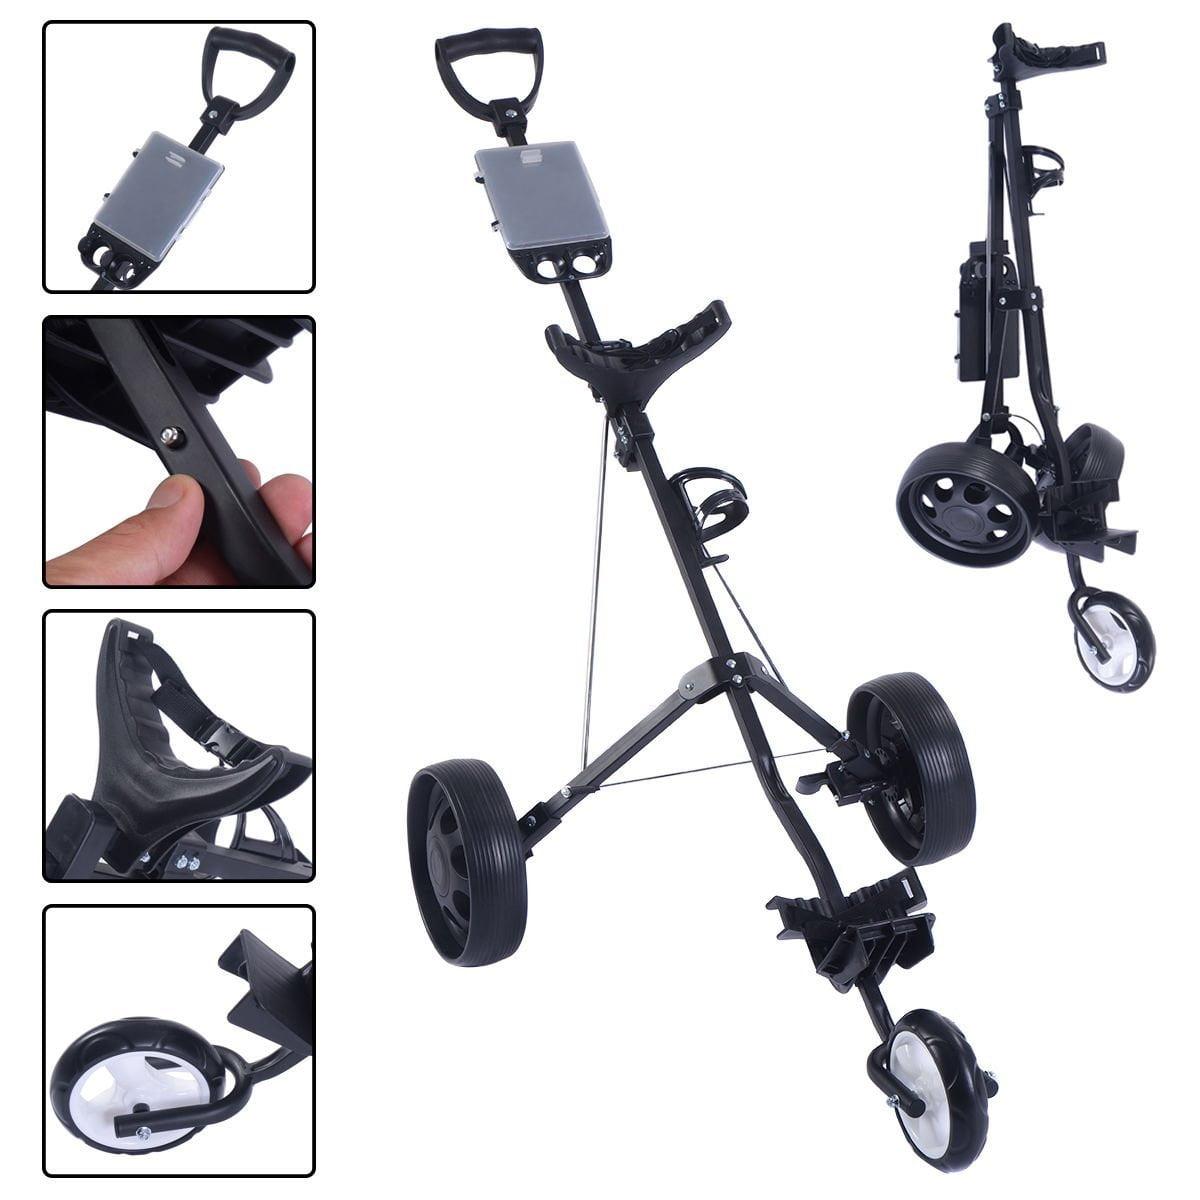 New MTN-G Foldable 3 Wheel Push Pull Golf Cart /Cup Holde...